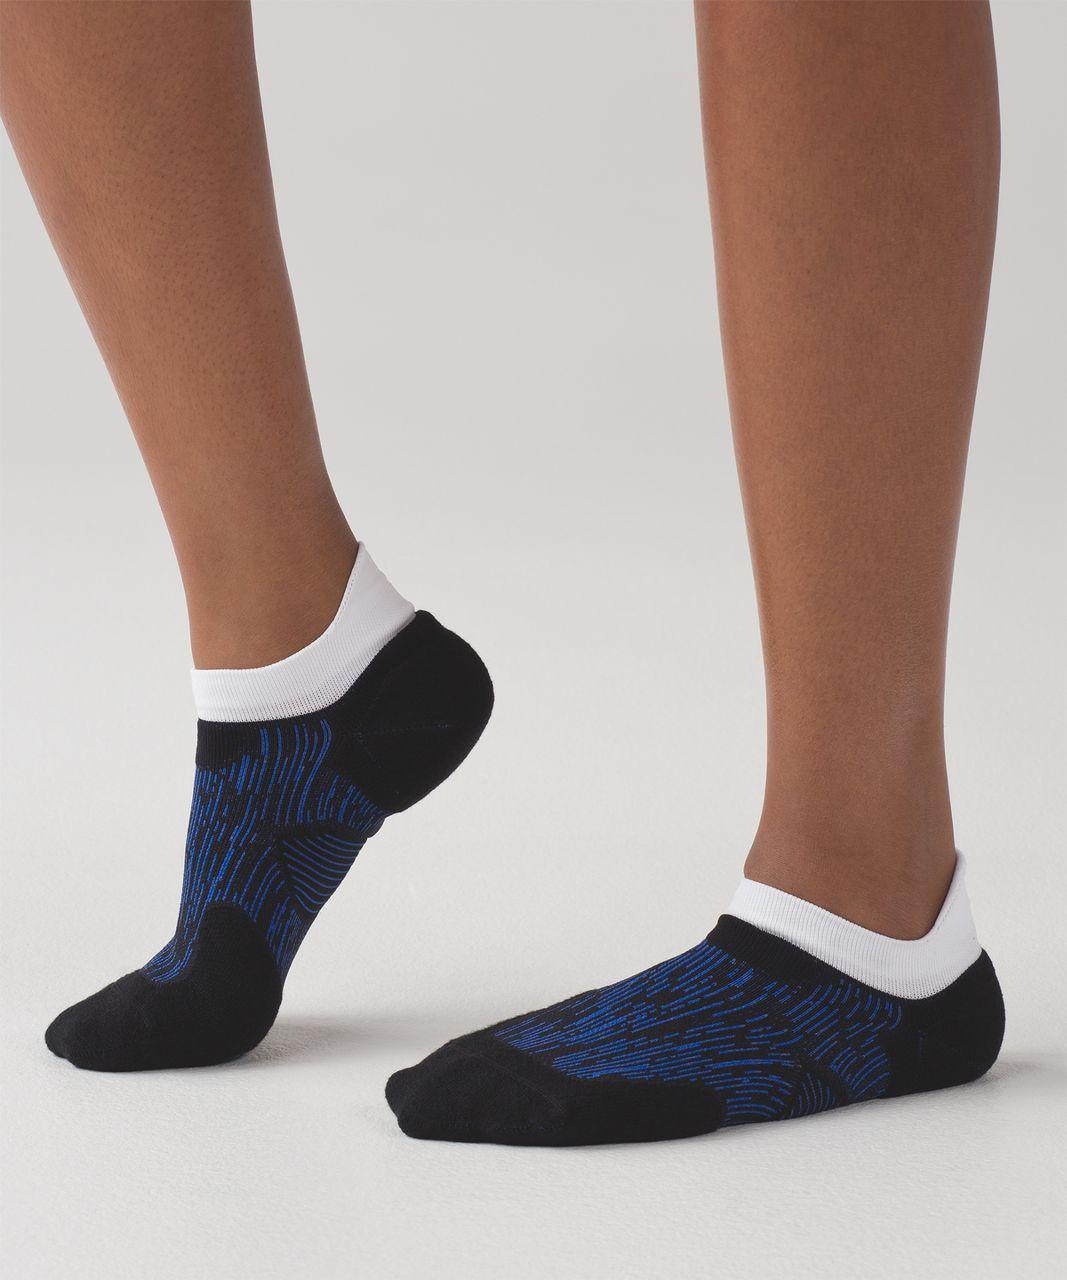 Lululemon High Speed Sock (Silver) - Cerulean Blue / Black / Indian Ocean